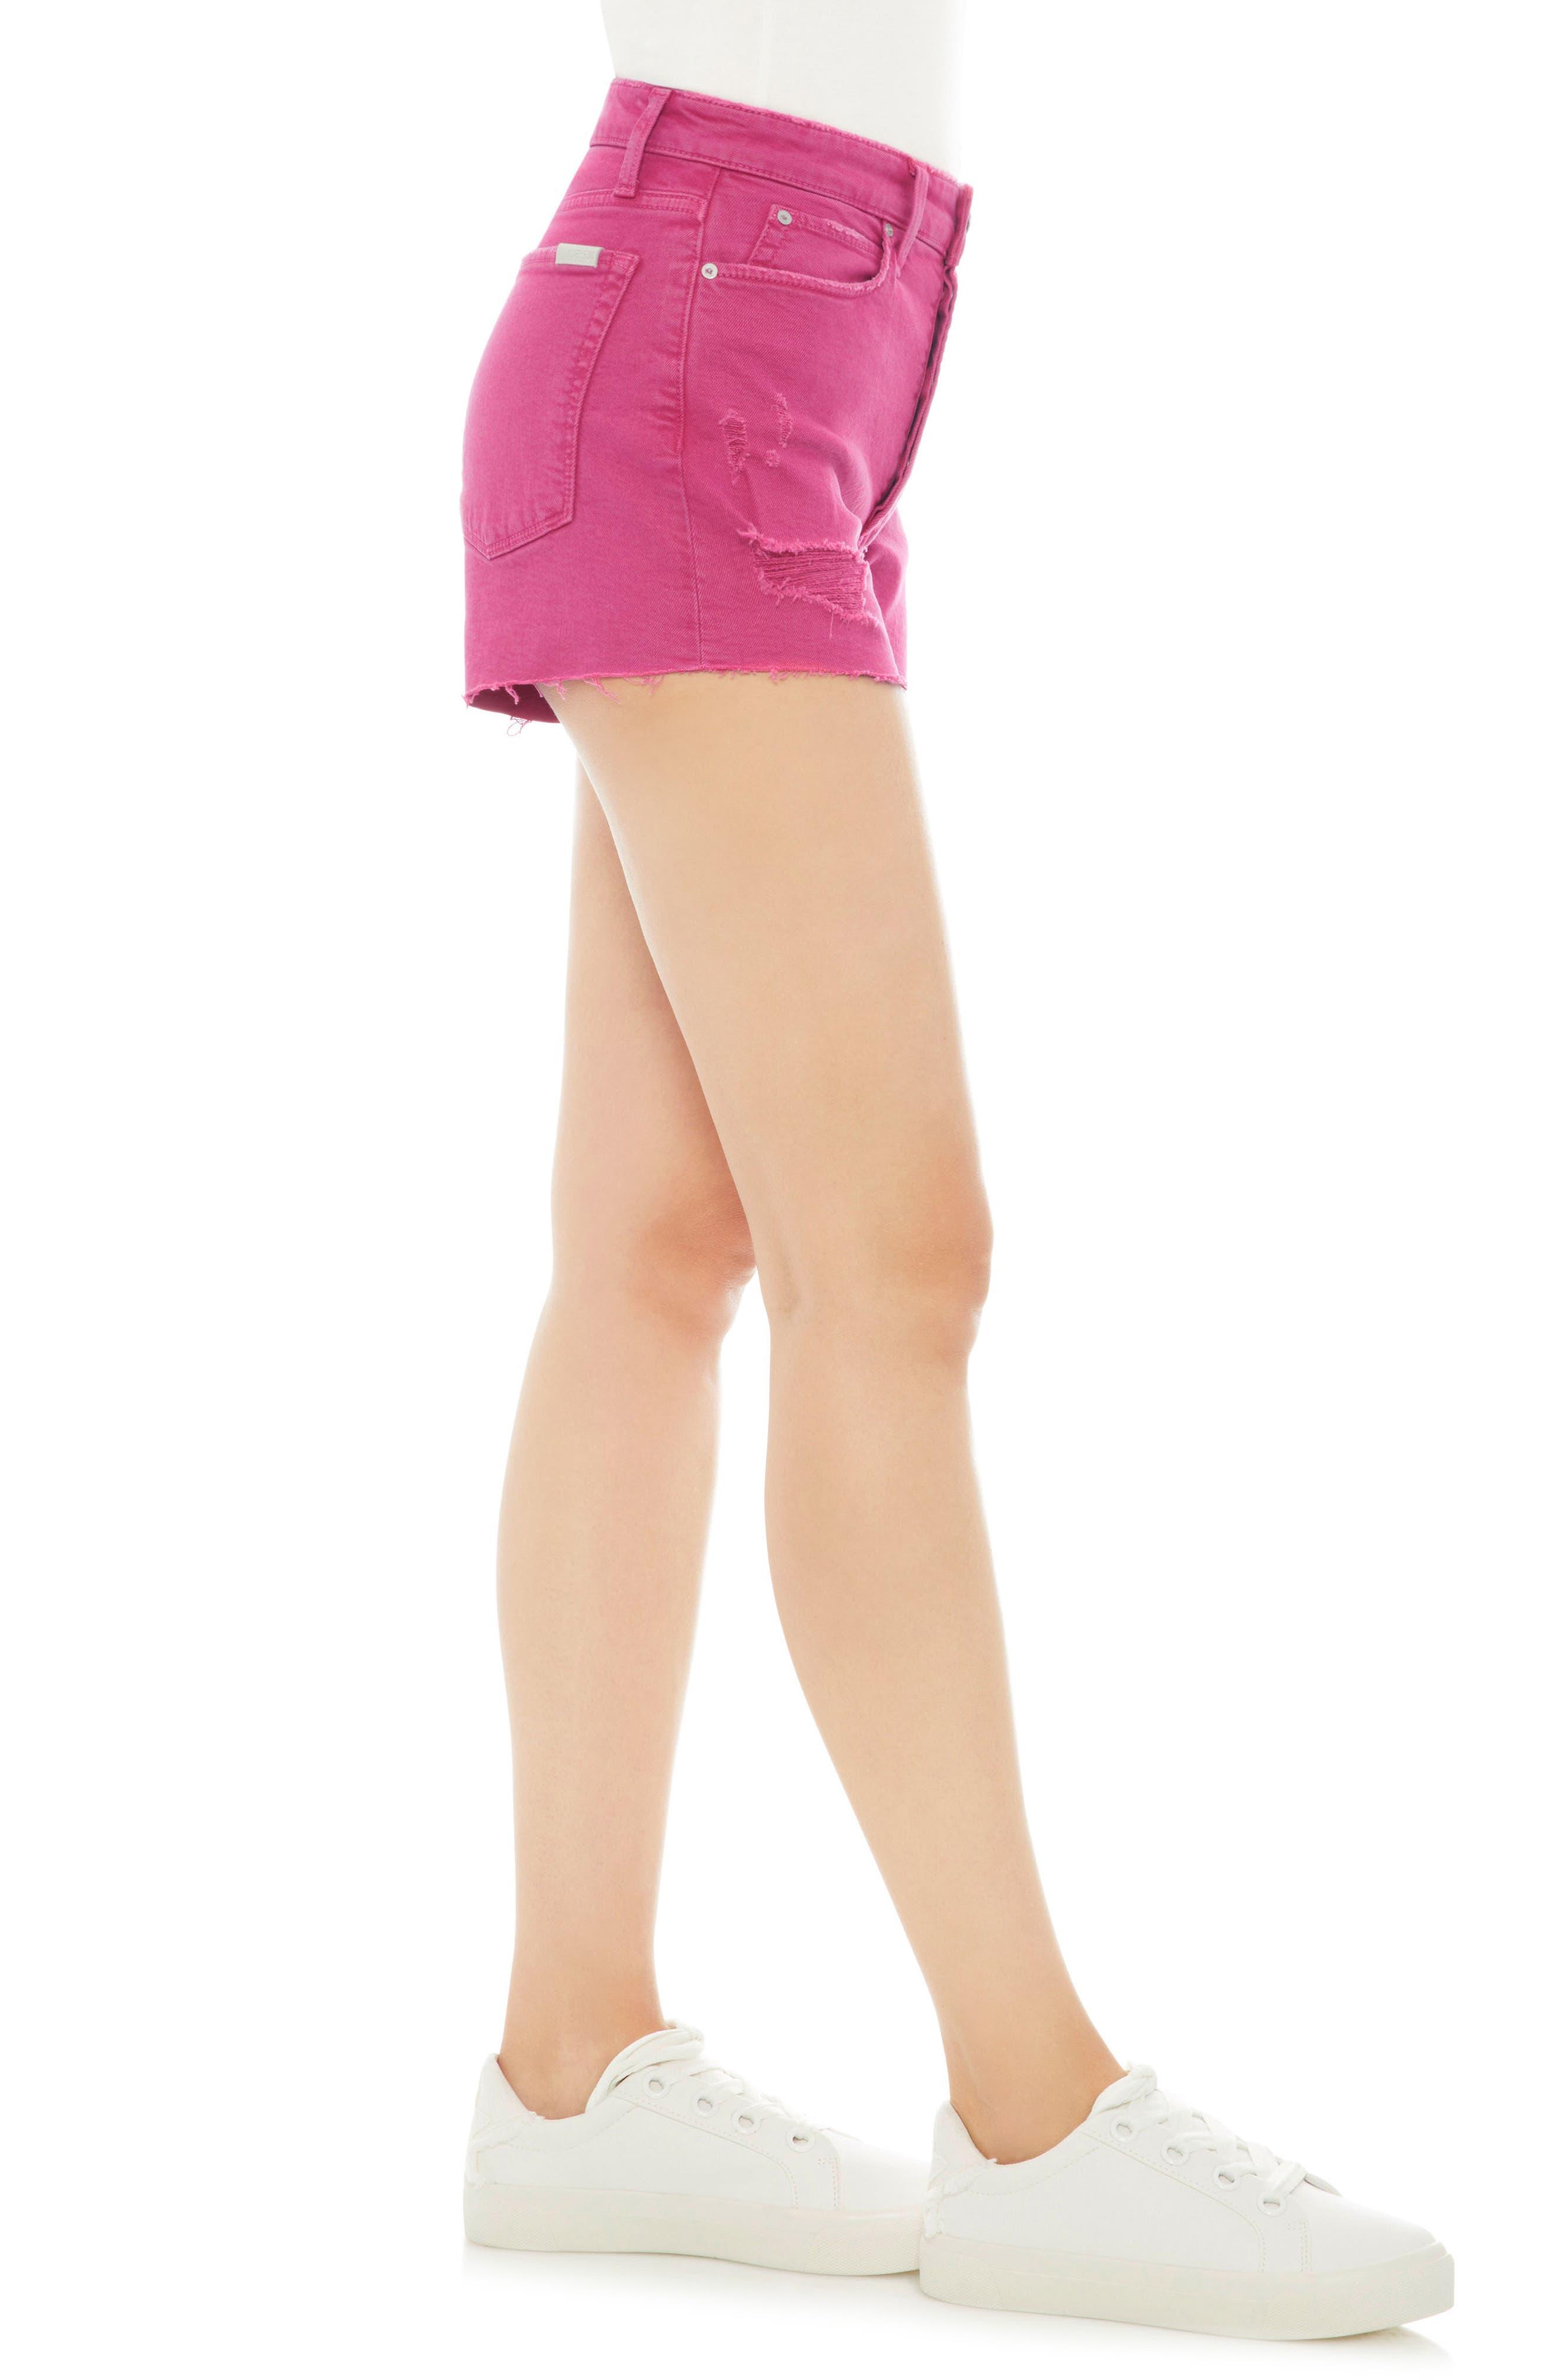 Smith High Waist Shorts,                             Alternate thumbnail 3, color,                             670